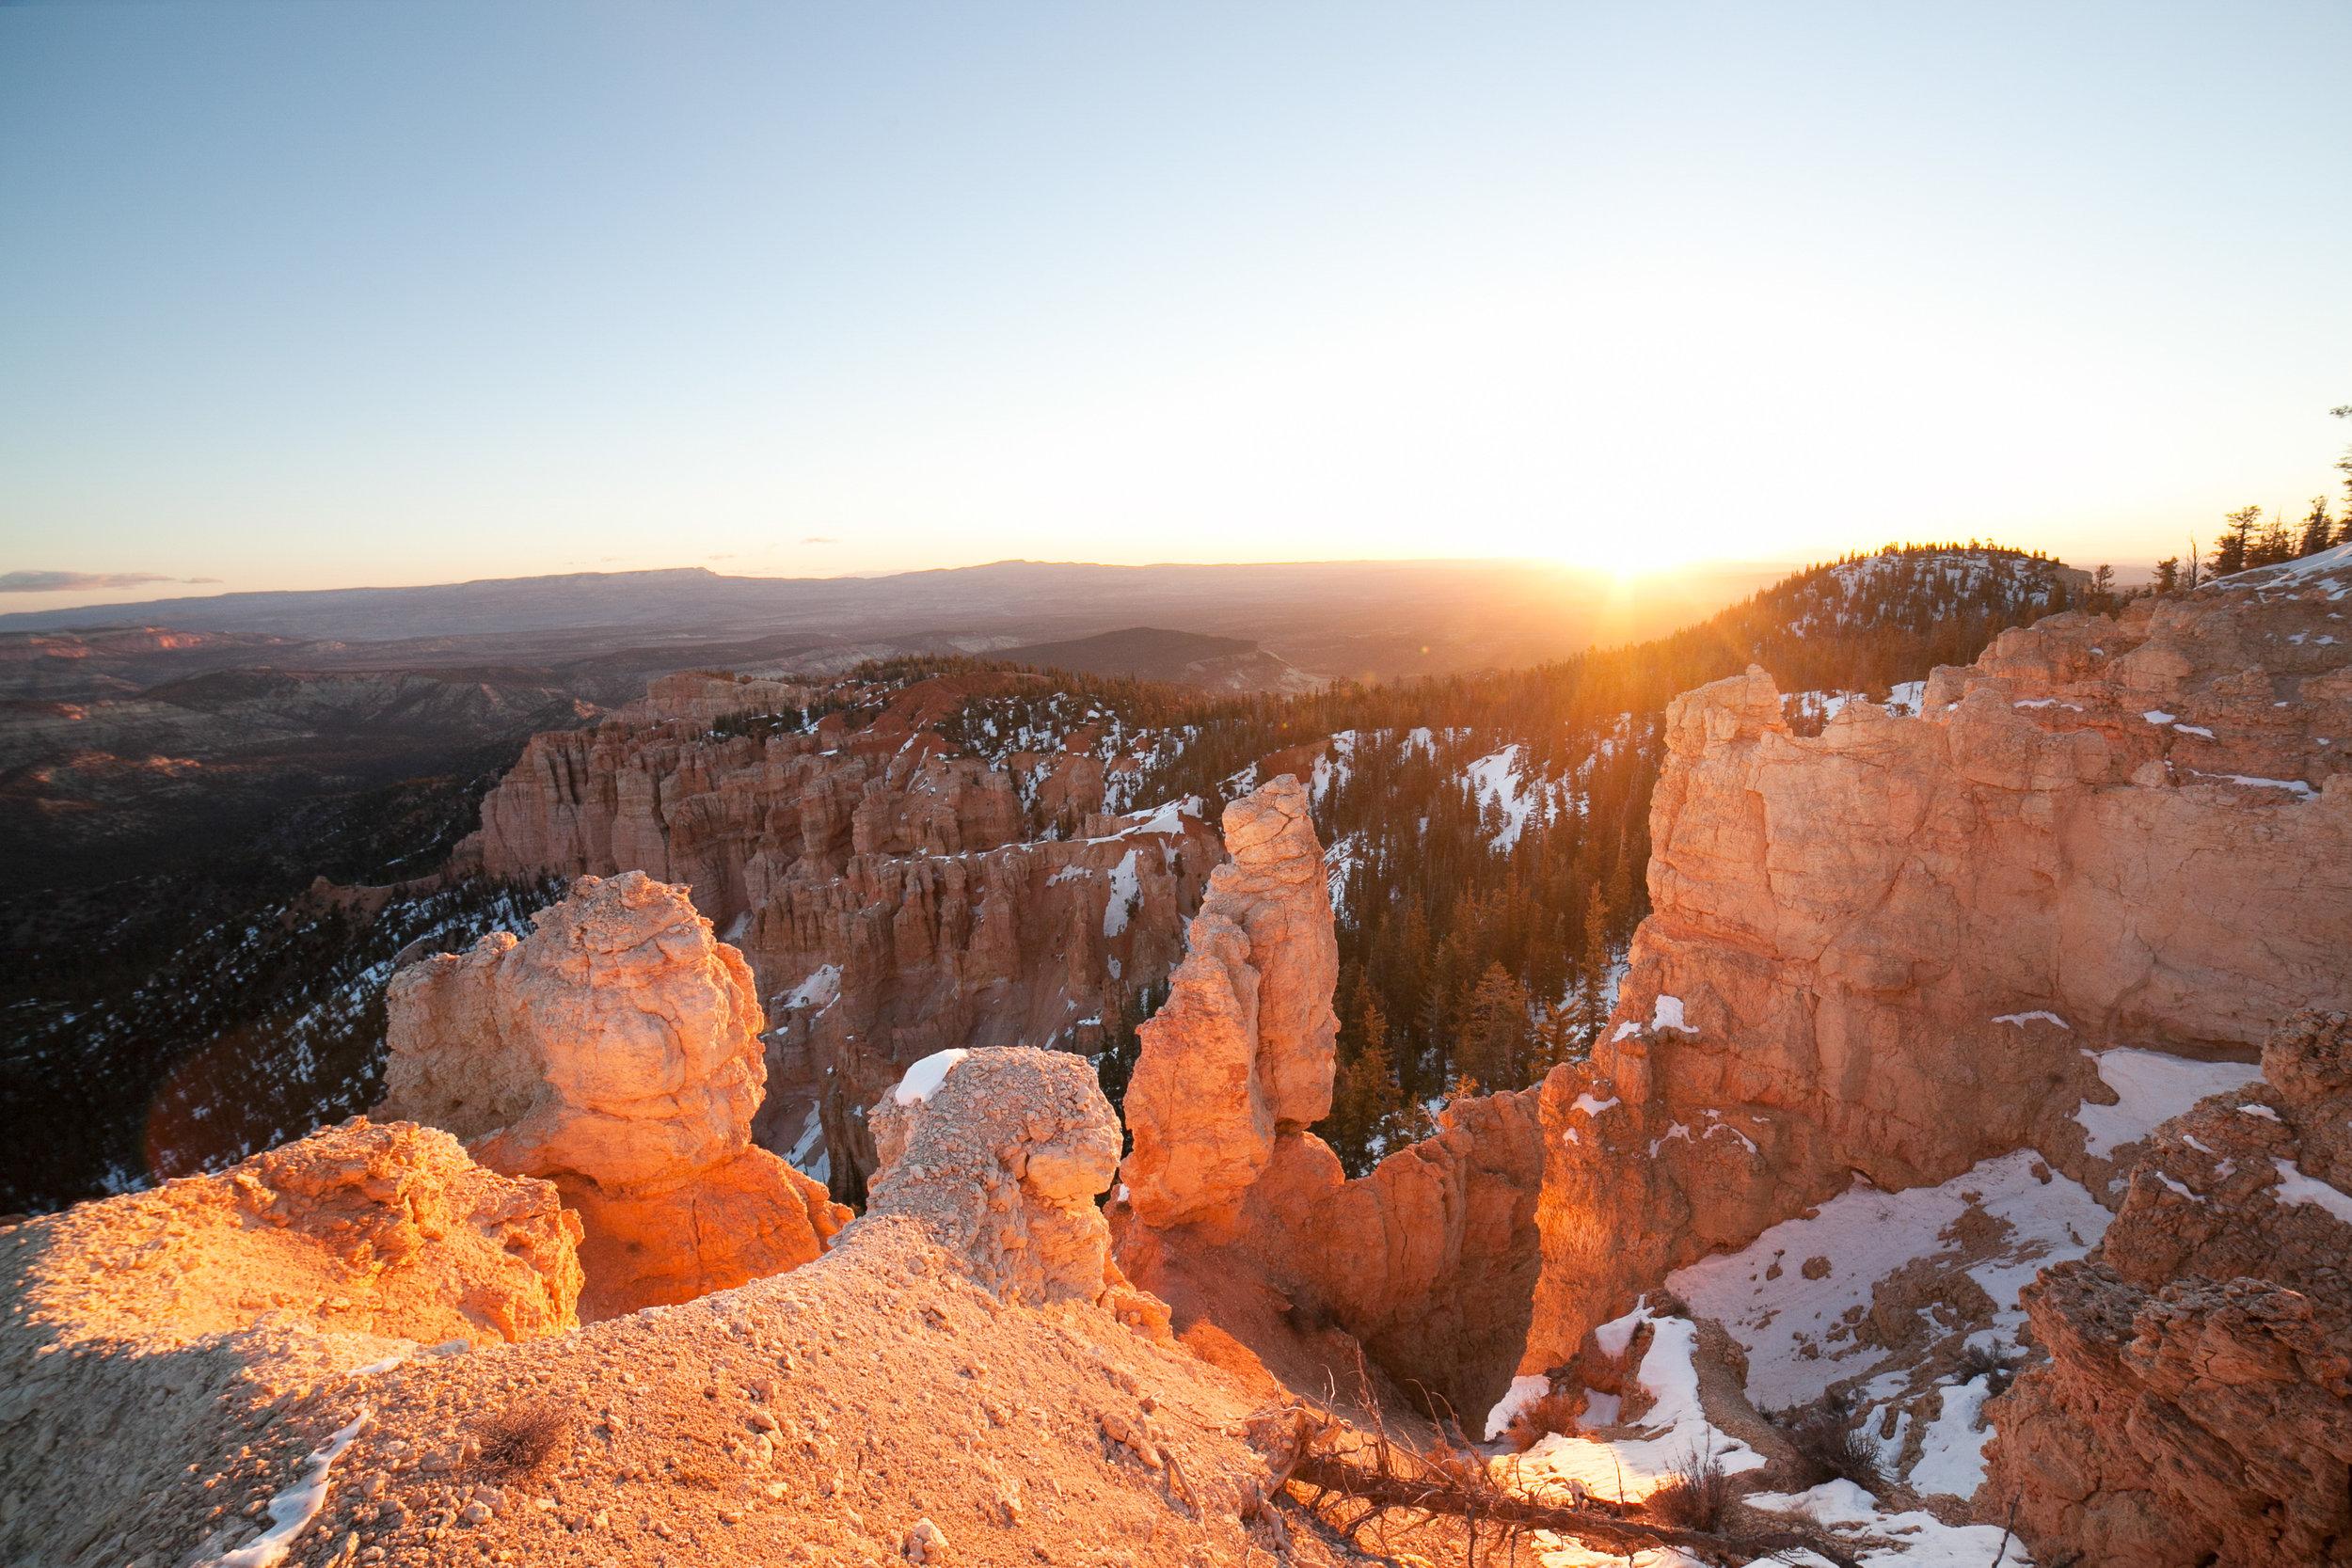 041Travel_Adventure_Photography_Outlive_Creative_Utah_Bryce_Canyon.jpg